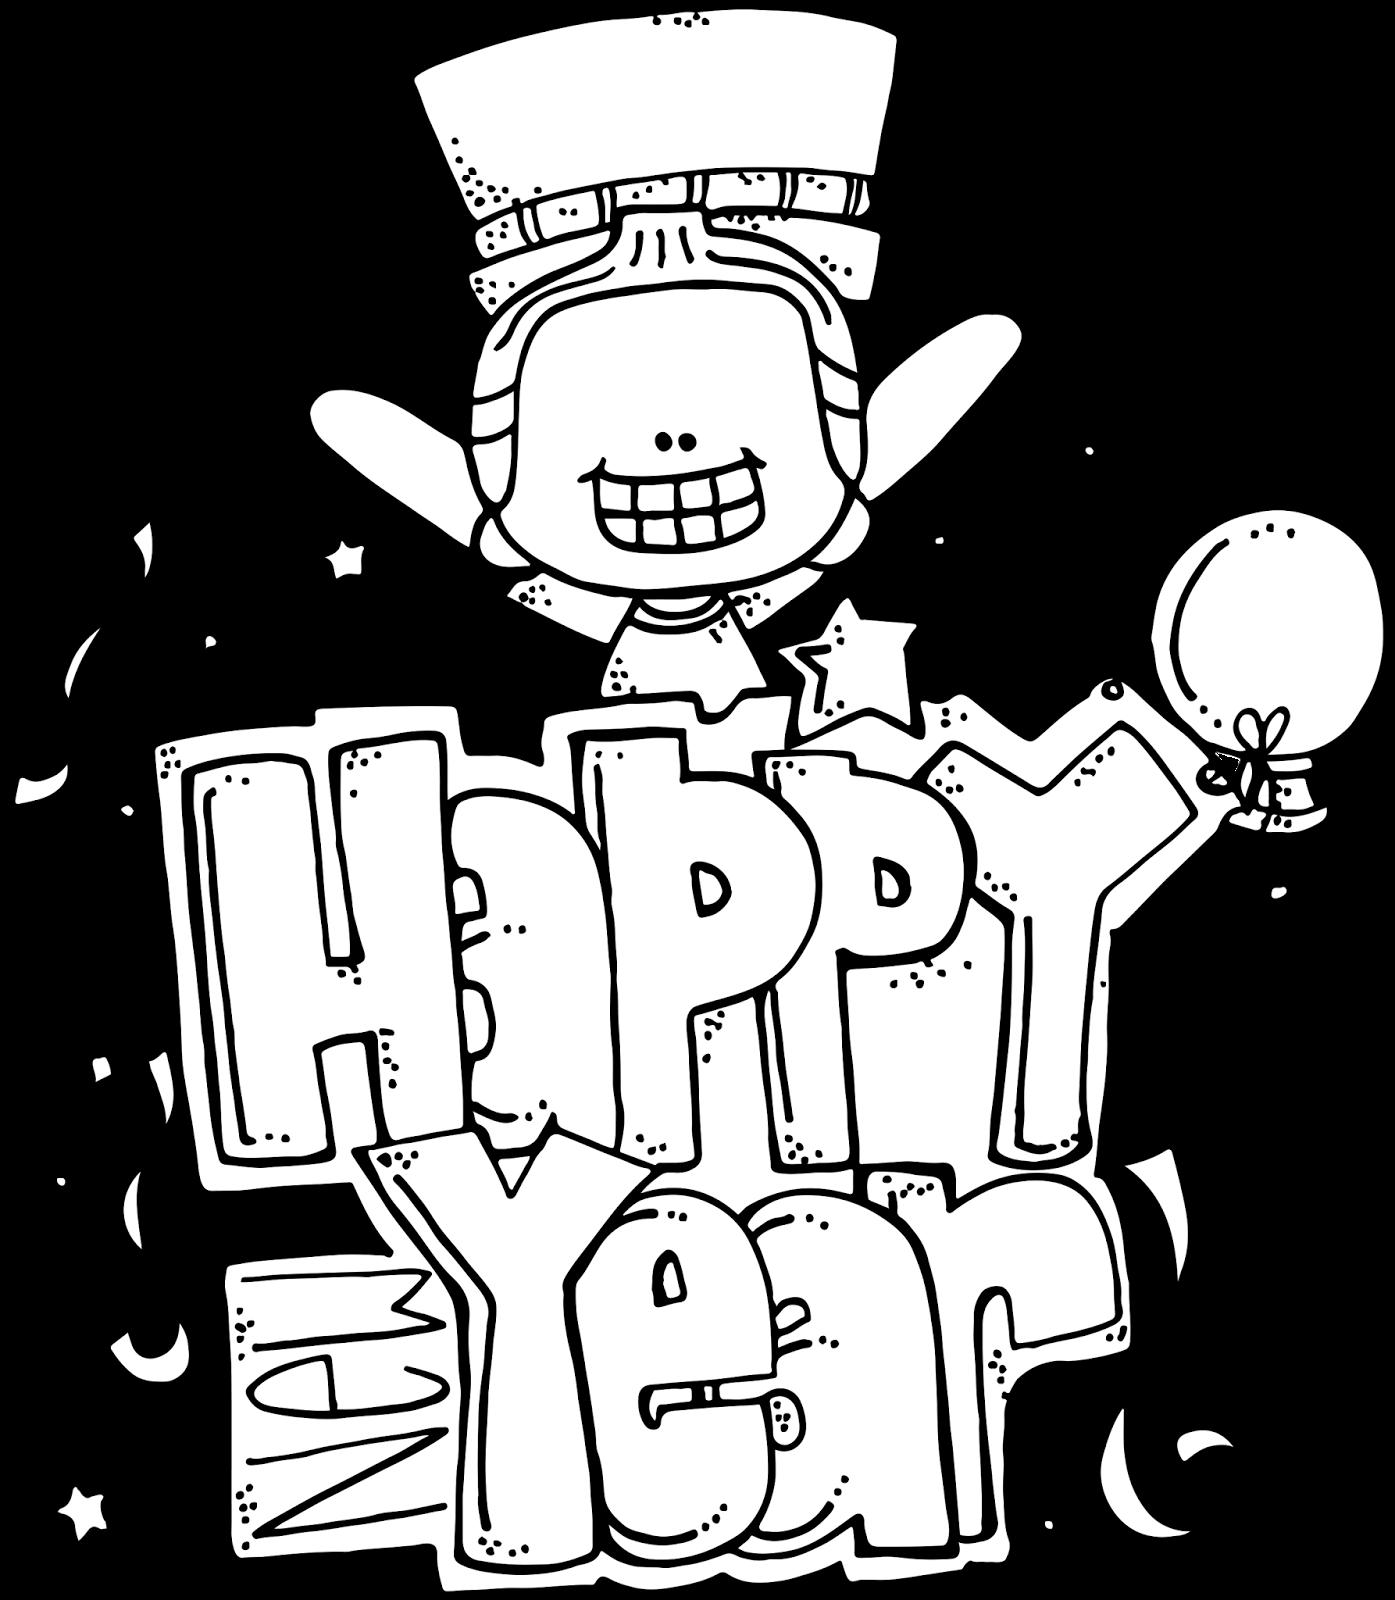 New Year clipart melonheadz Melonheadz  Melonheadz Ideas Freebie!!!!